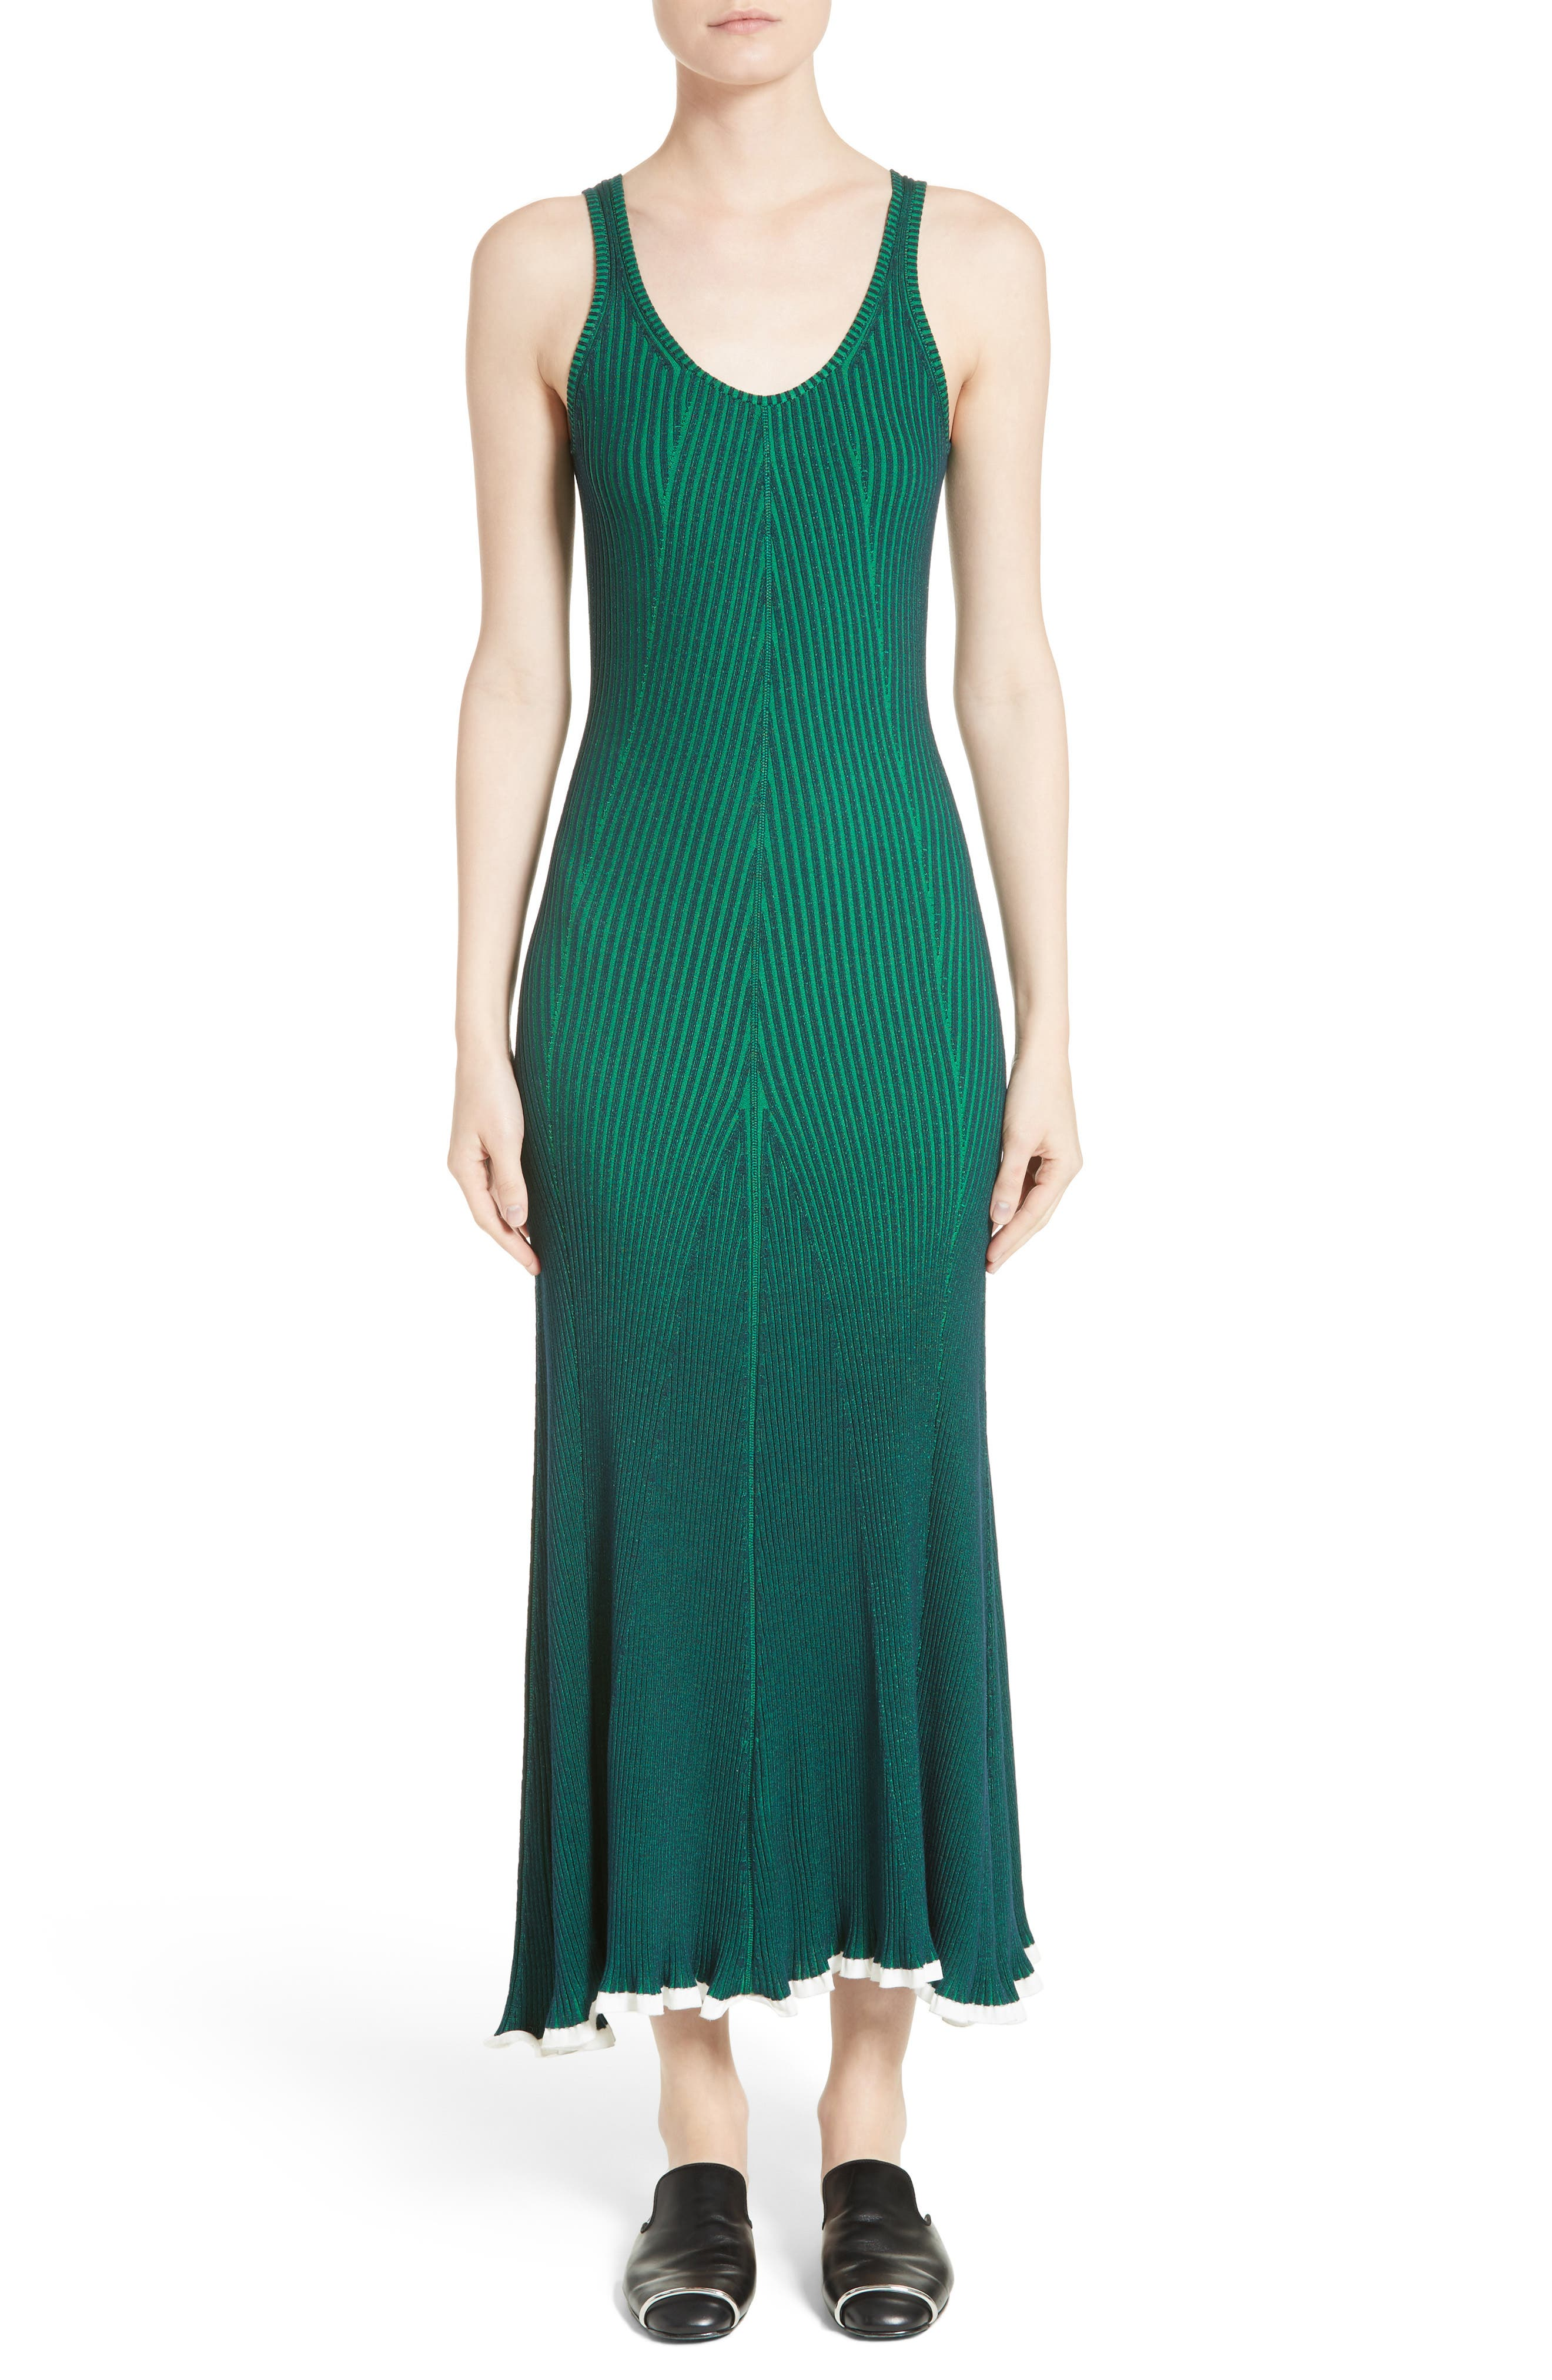 Ribbed Maxi Dress,                             Main thumbnail 1, color,                             Navy With Emerald Combo